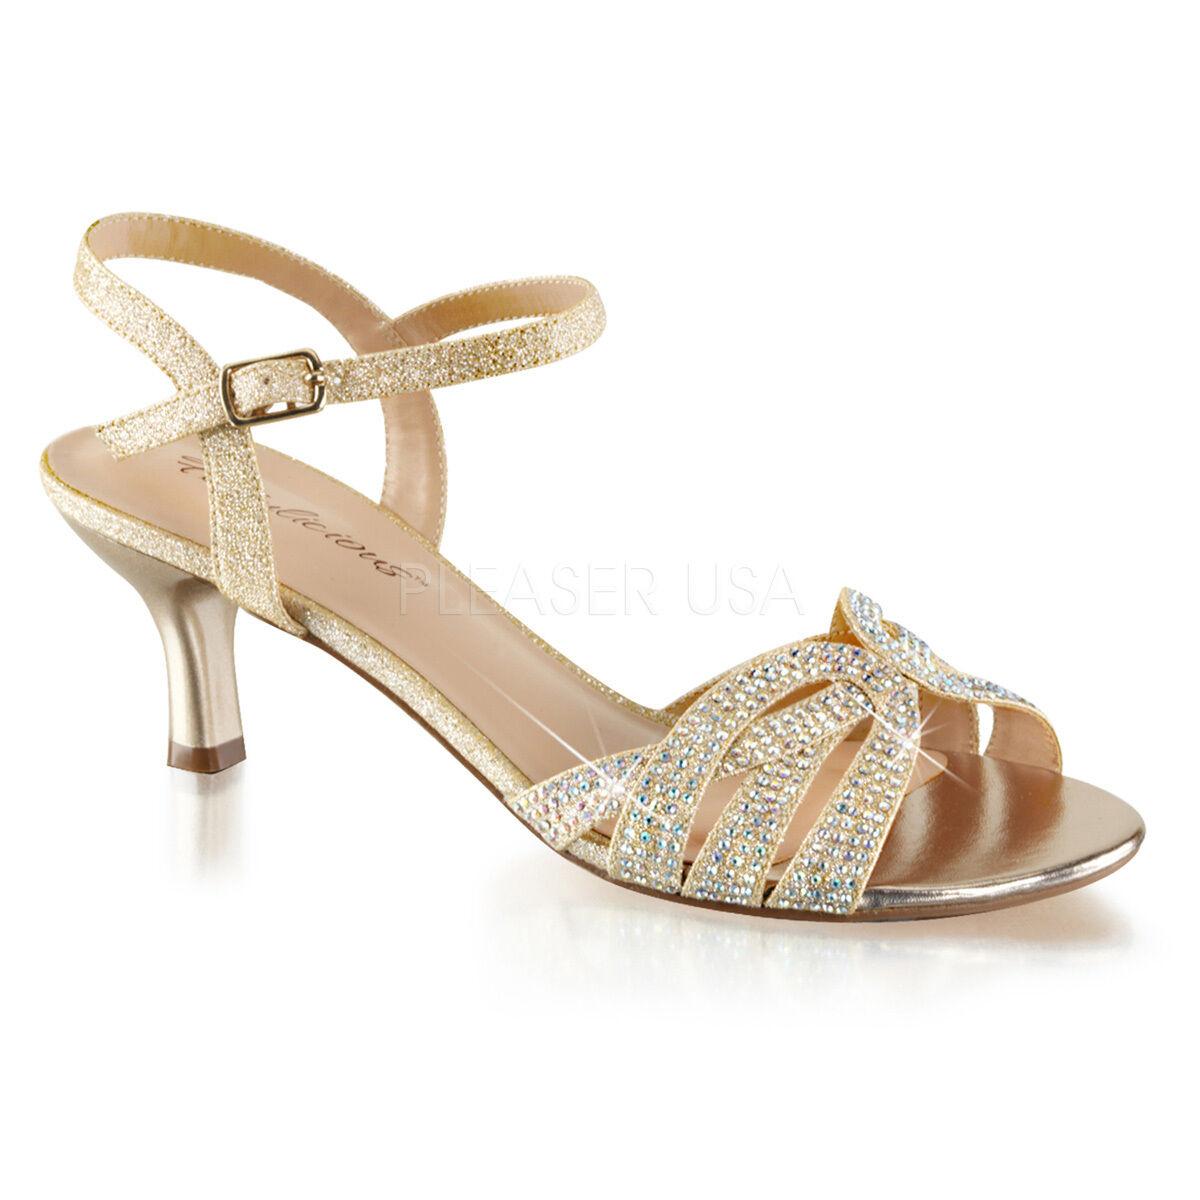 gold Rhinestone Low Heels Junior Bridesmaid Vintage Bridal shoes size 6 7 8 9 10